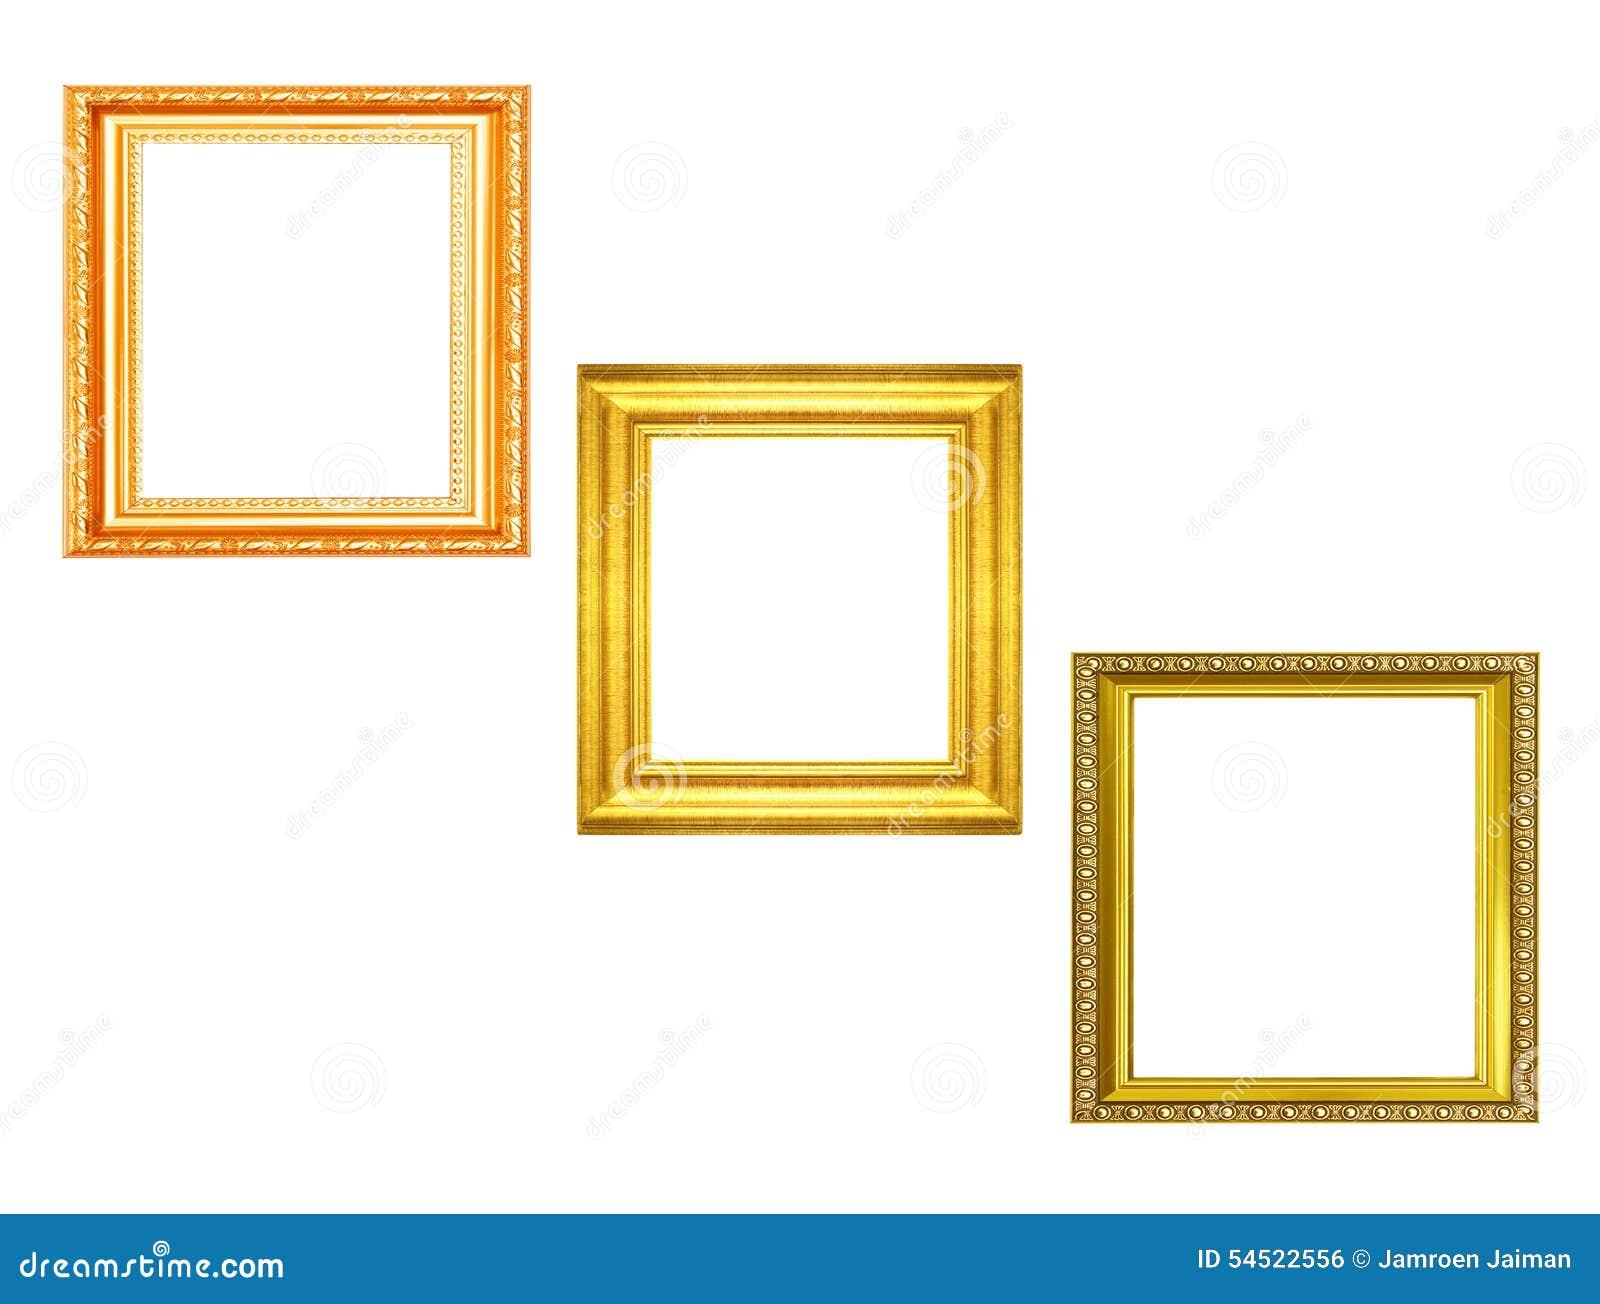 2298dda422df Set Of Golden Vintage Frame Isolated On Black Background Stock Photo ...